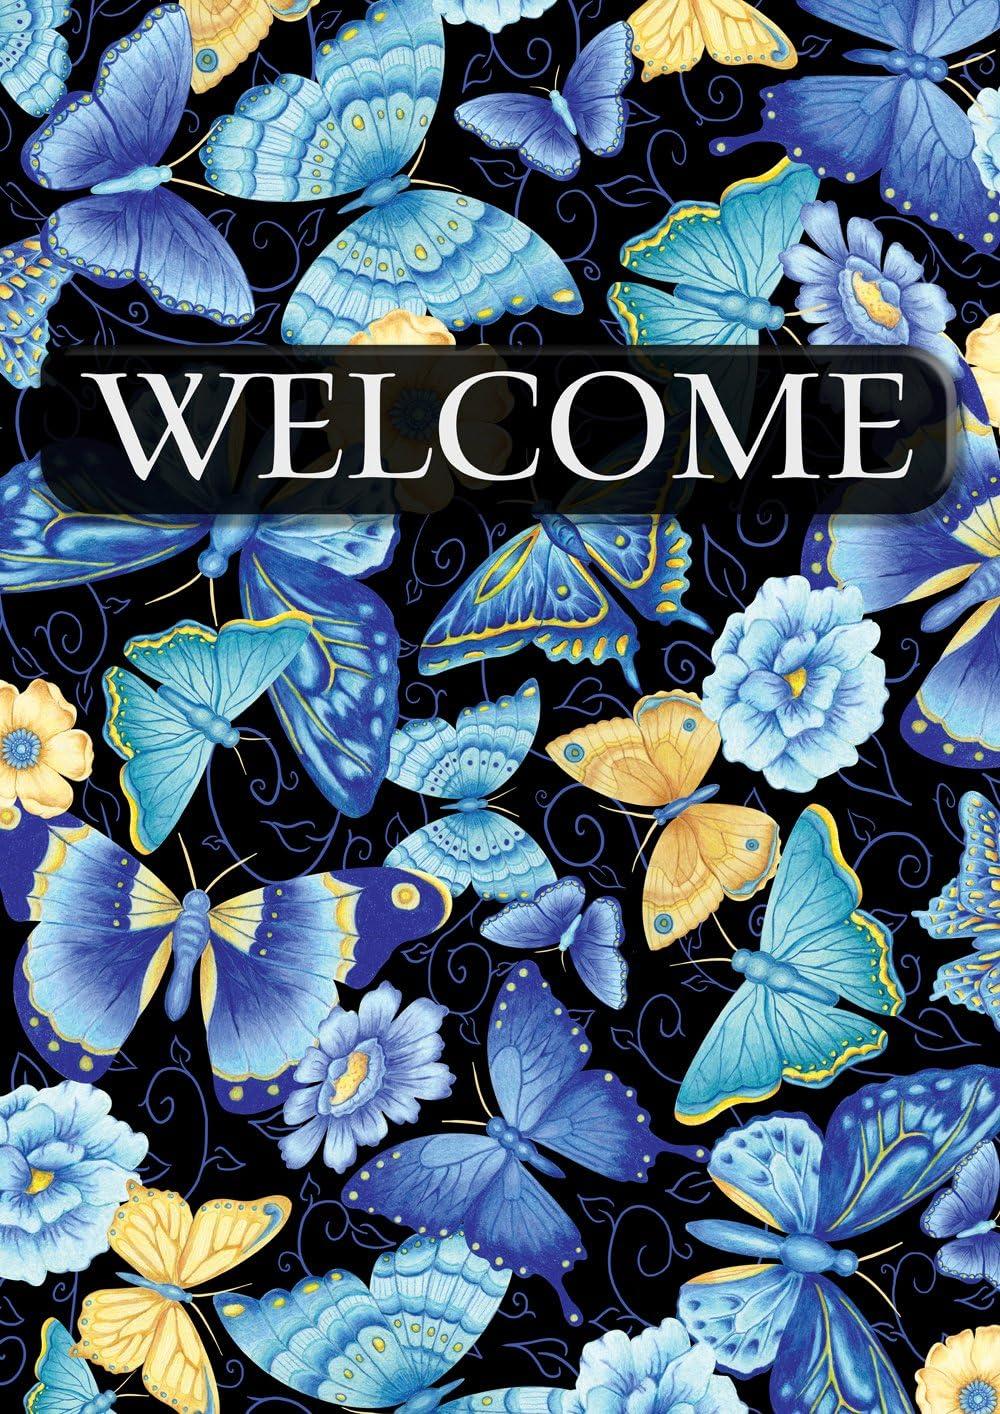 Toland Home Garden 1112002 Blue Butterfly Welcome 12.5 x 18 Inch Decorative, Garden Flag (12.5